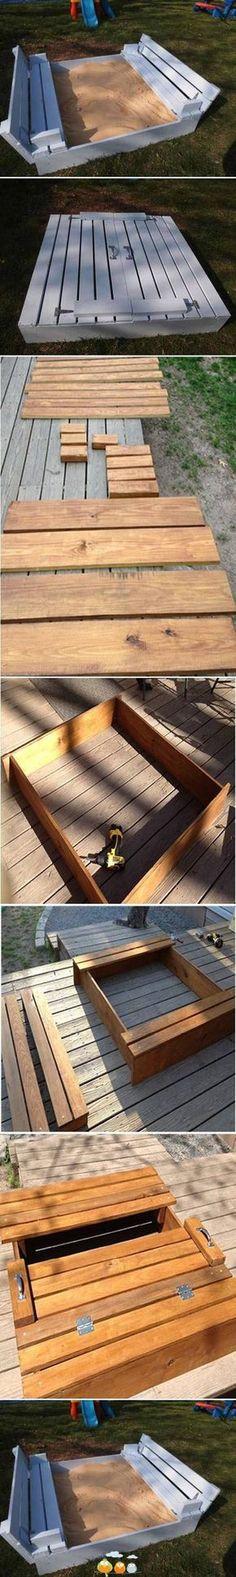 A pallet sandbox for an easy DIY.